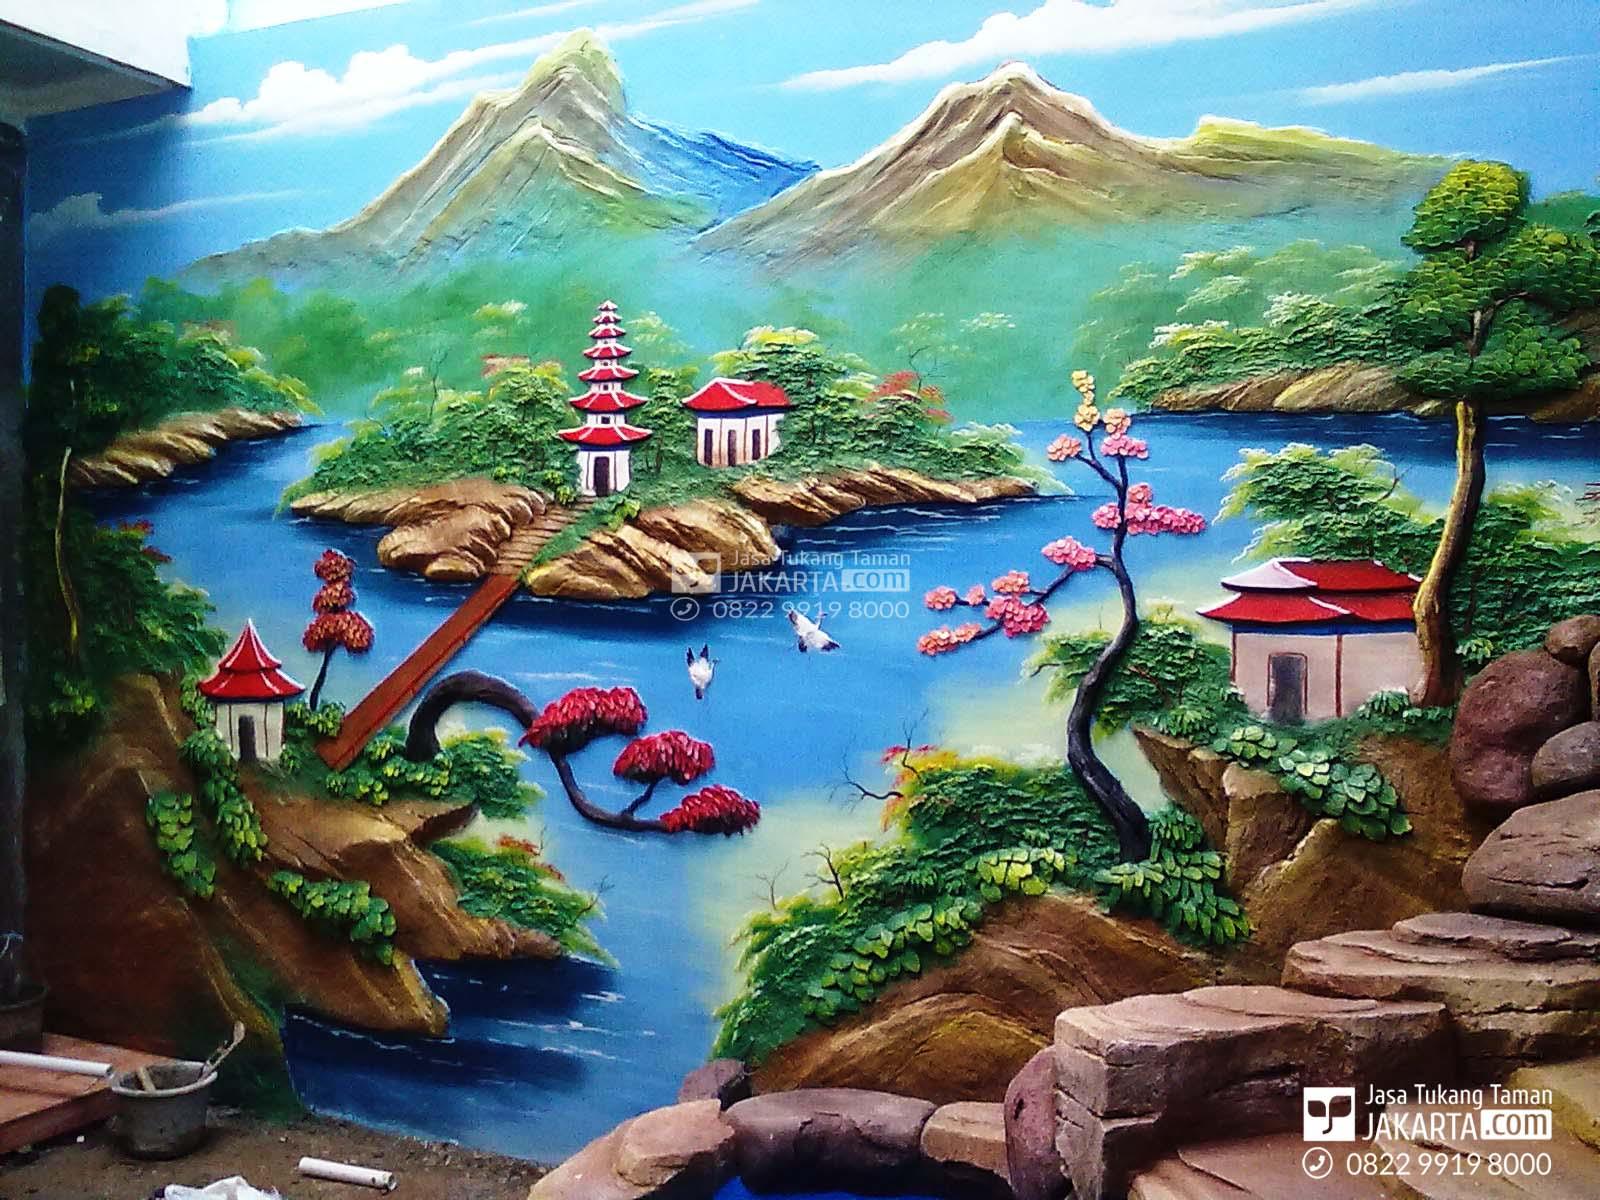 Jasa Taman Relif Tangerang